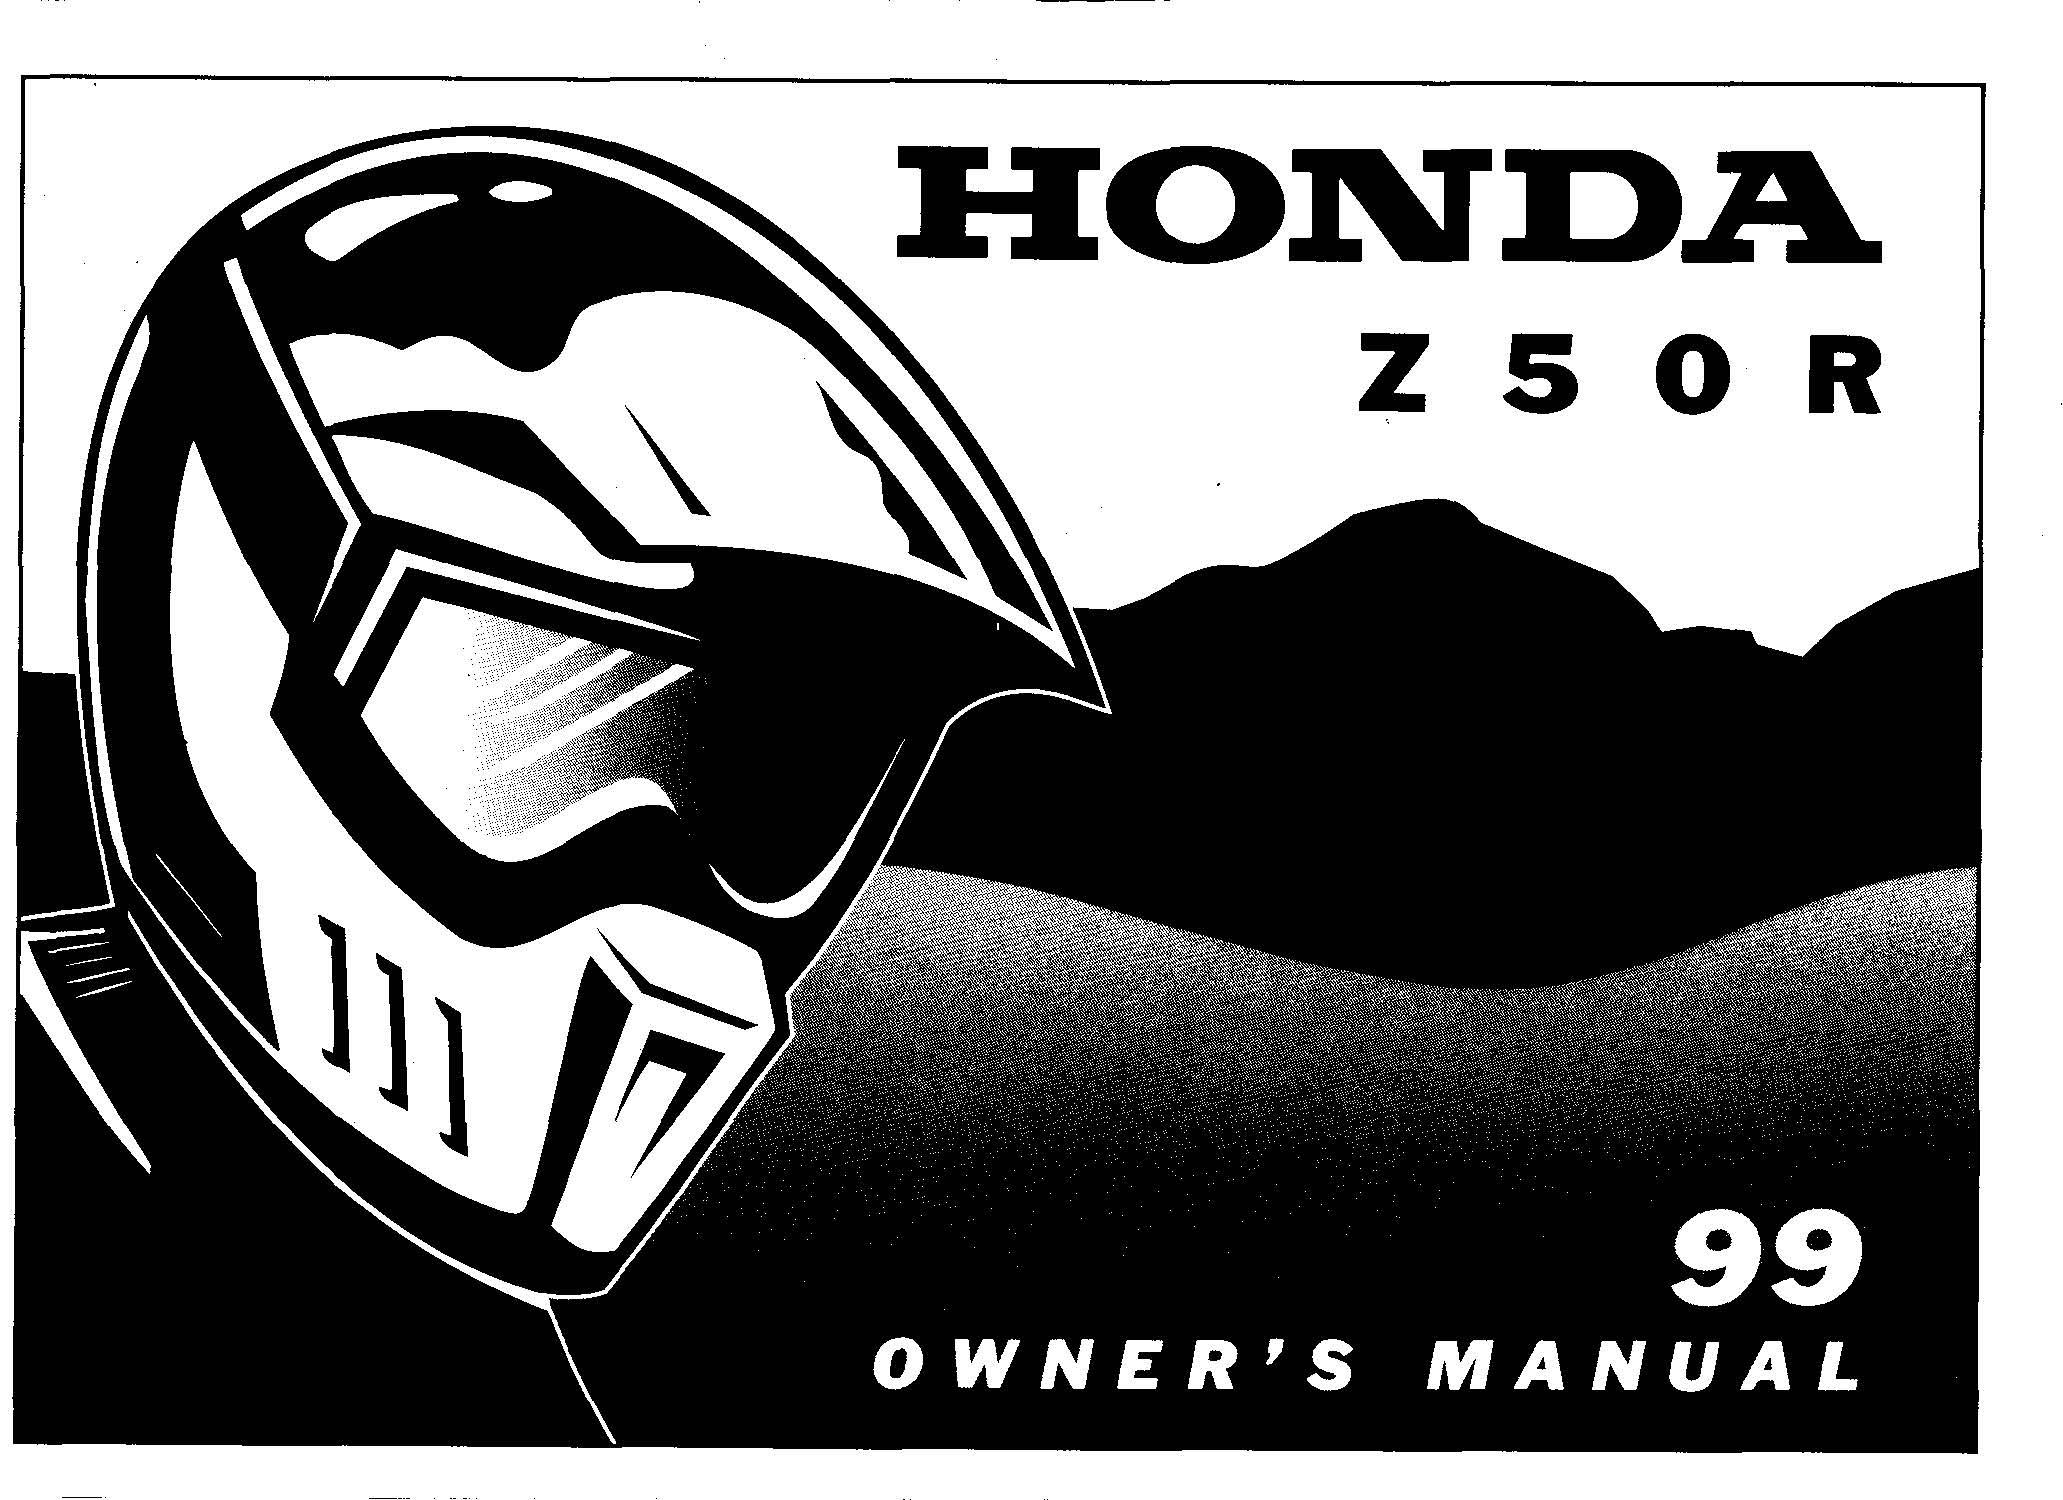 Honda Zr Owner S Manual Stroke All The Data For Honda Z50r Owner S  Manual